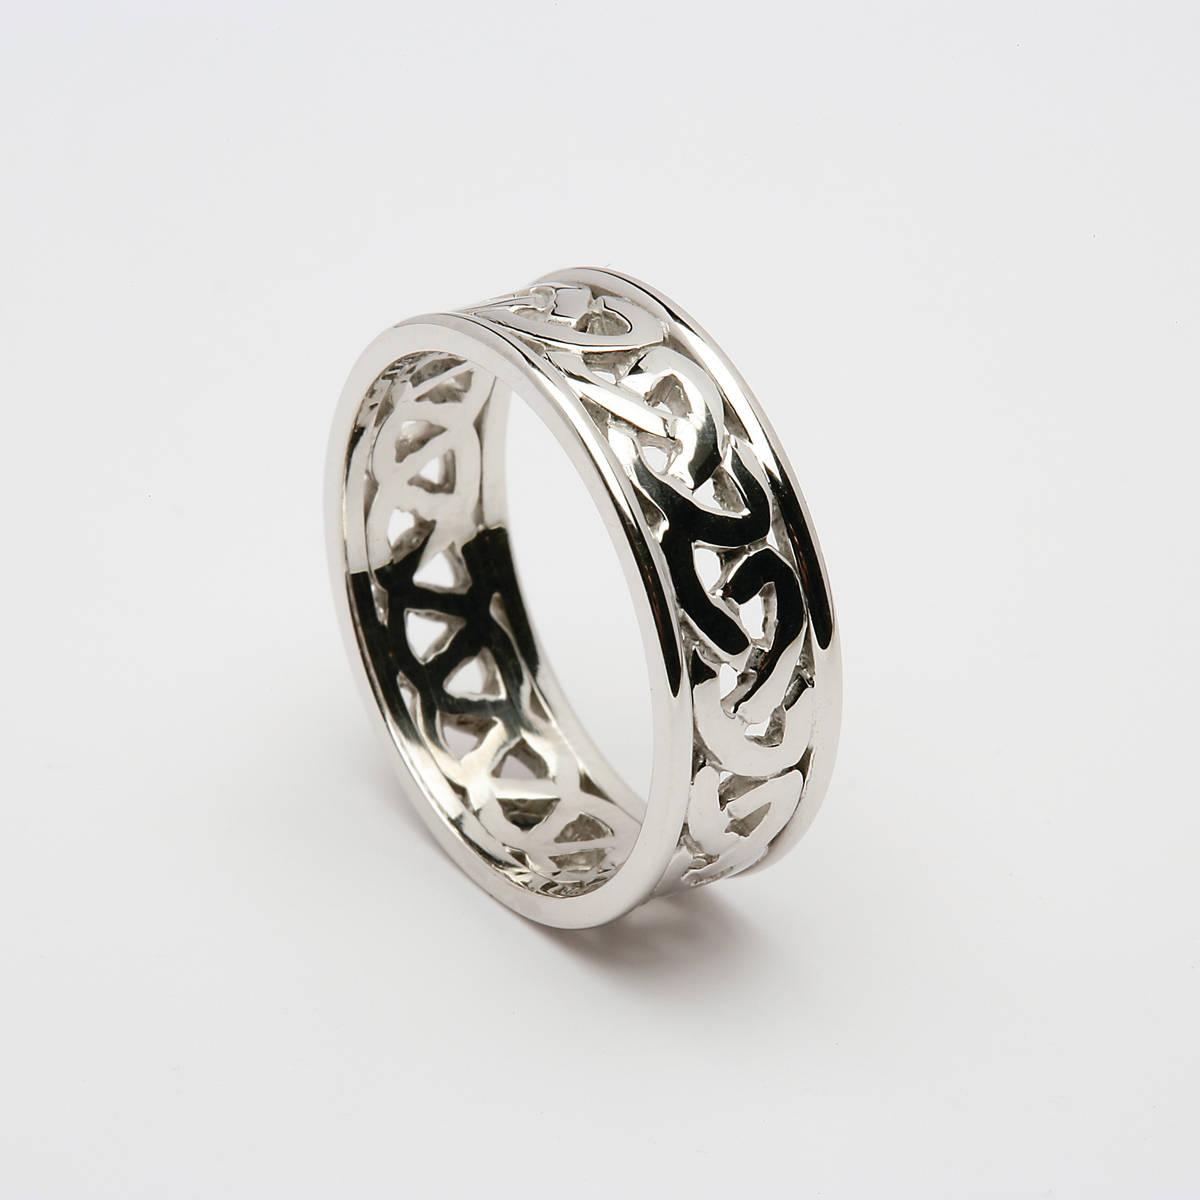 18 carat white gold Celtic unisex wedding ring